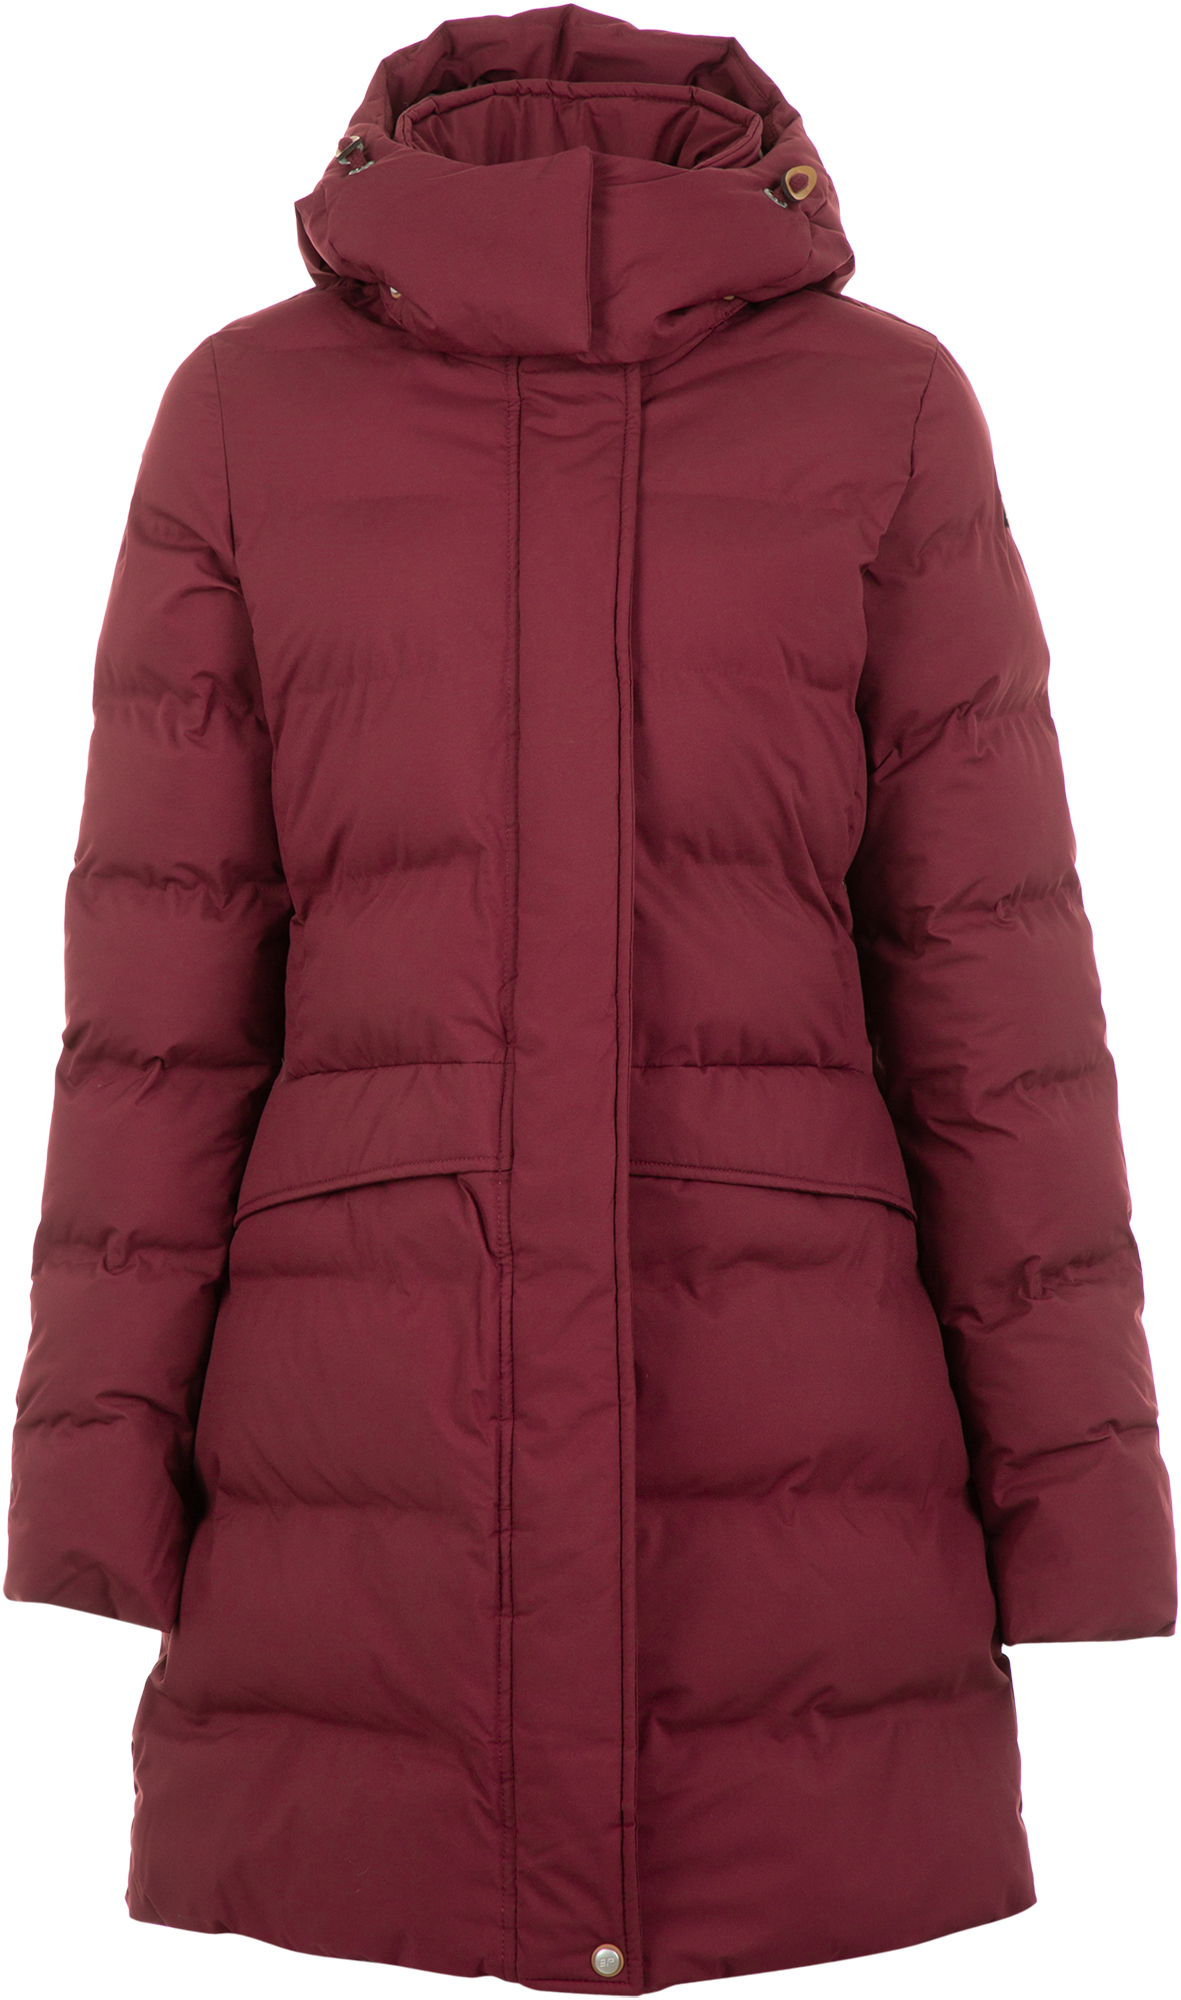 IcePeak Куртка утепленная женская IcePeak Anoka, размер 50